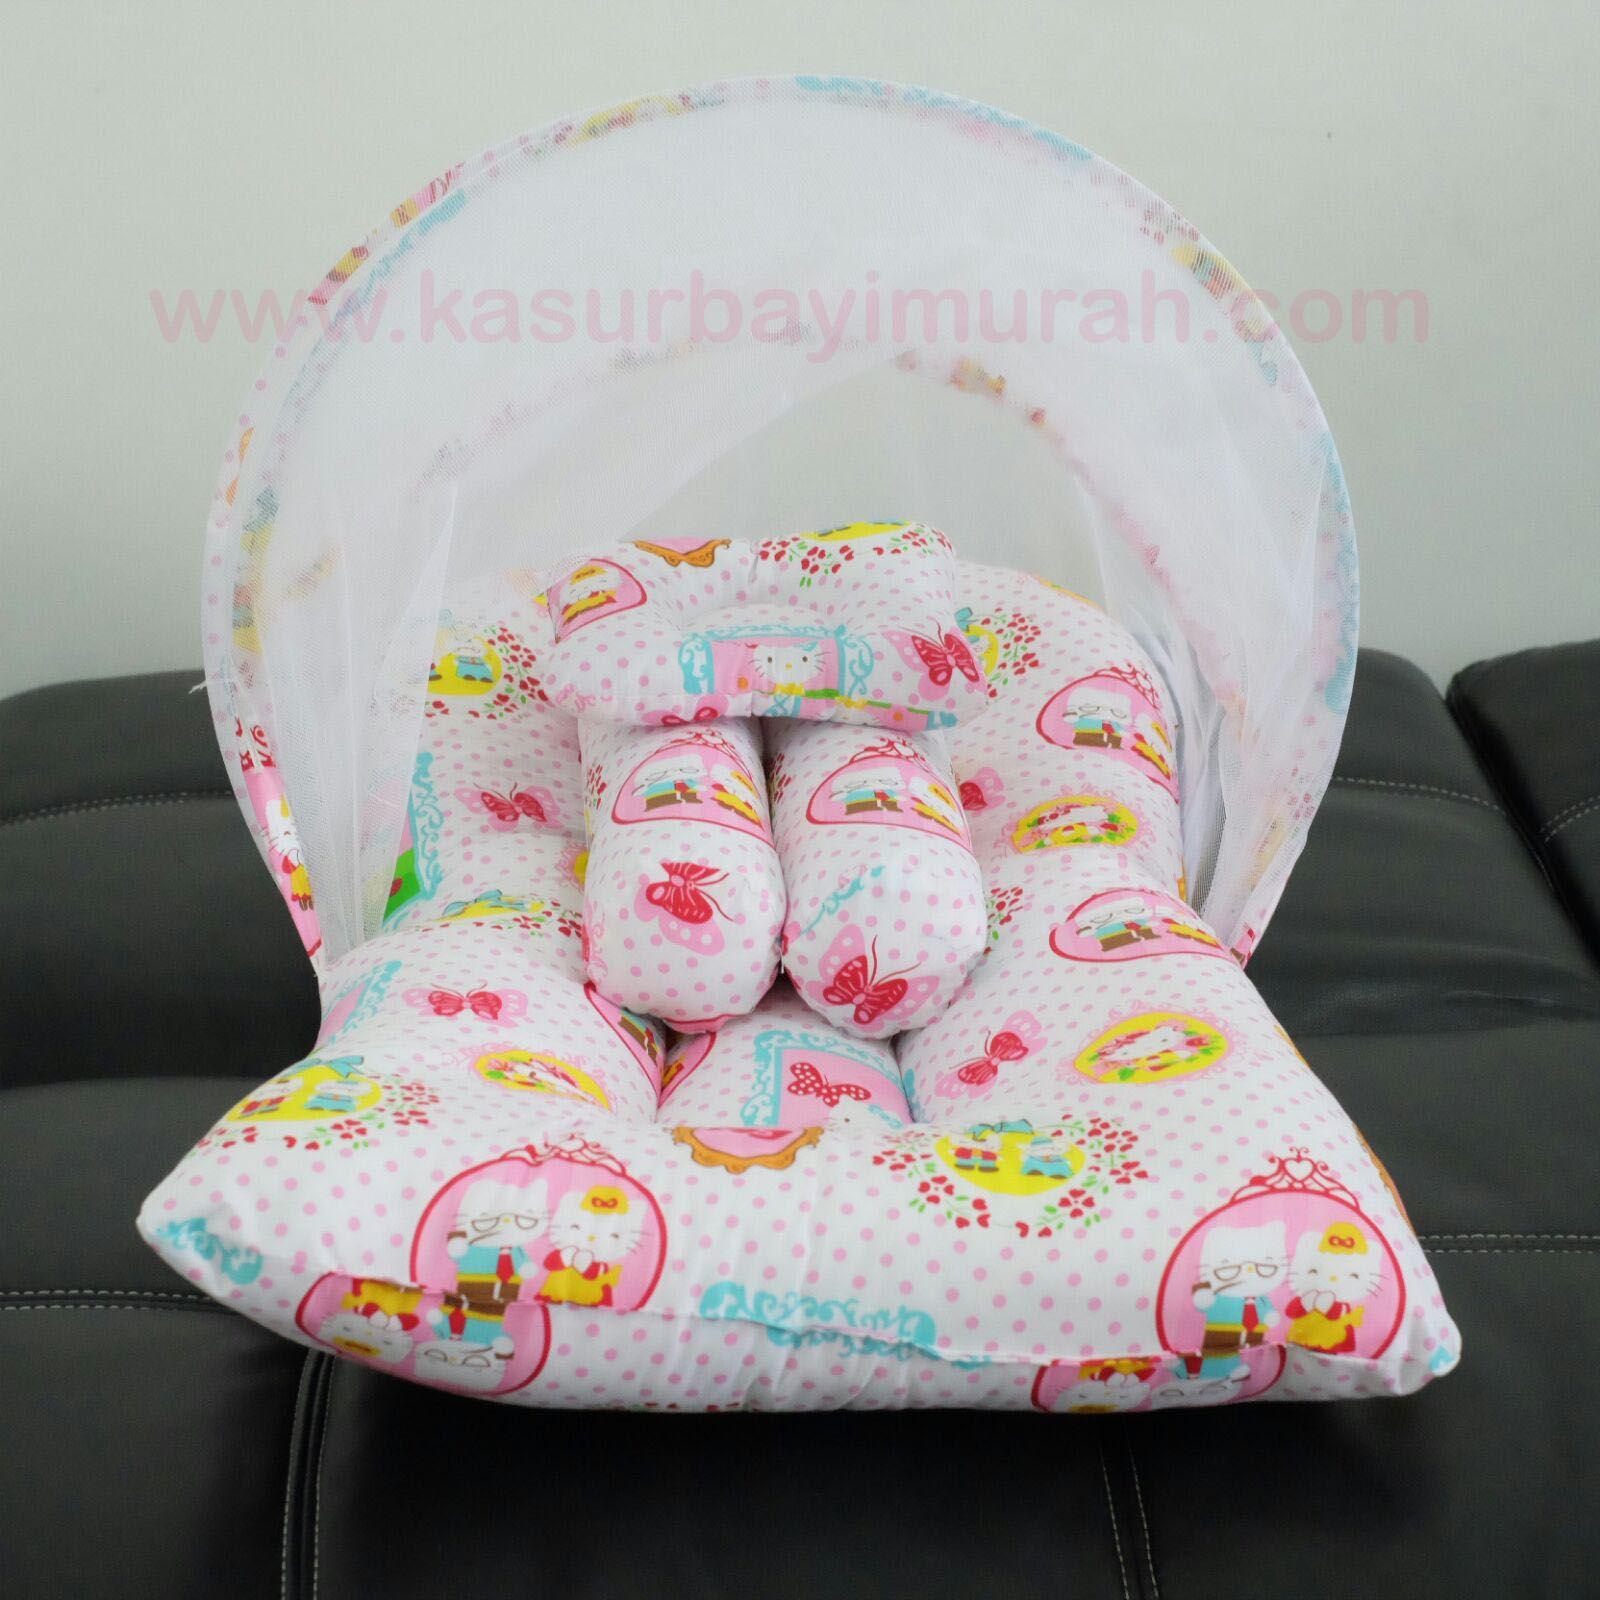 Tempat Tidur Bayi Set TTB12 Tempat Tidur Bayi Pinterest